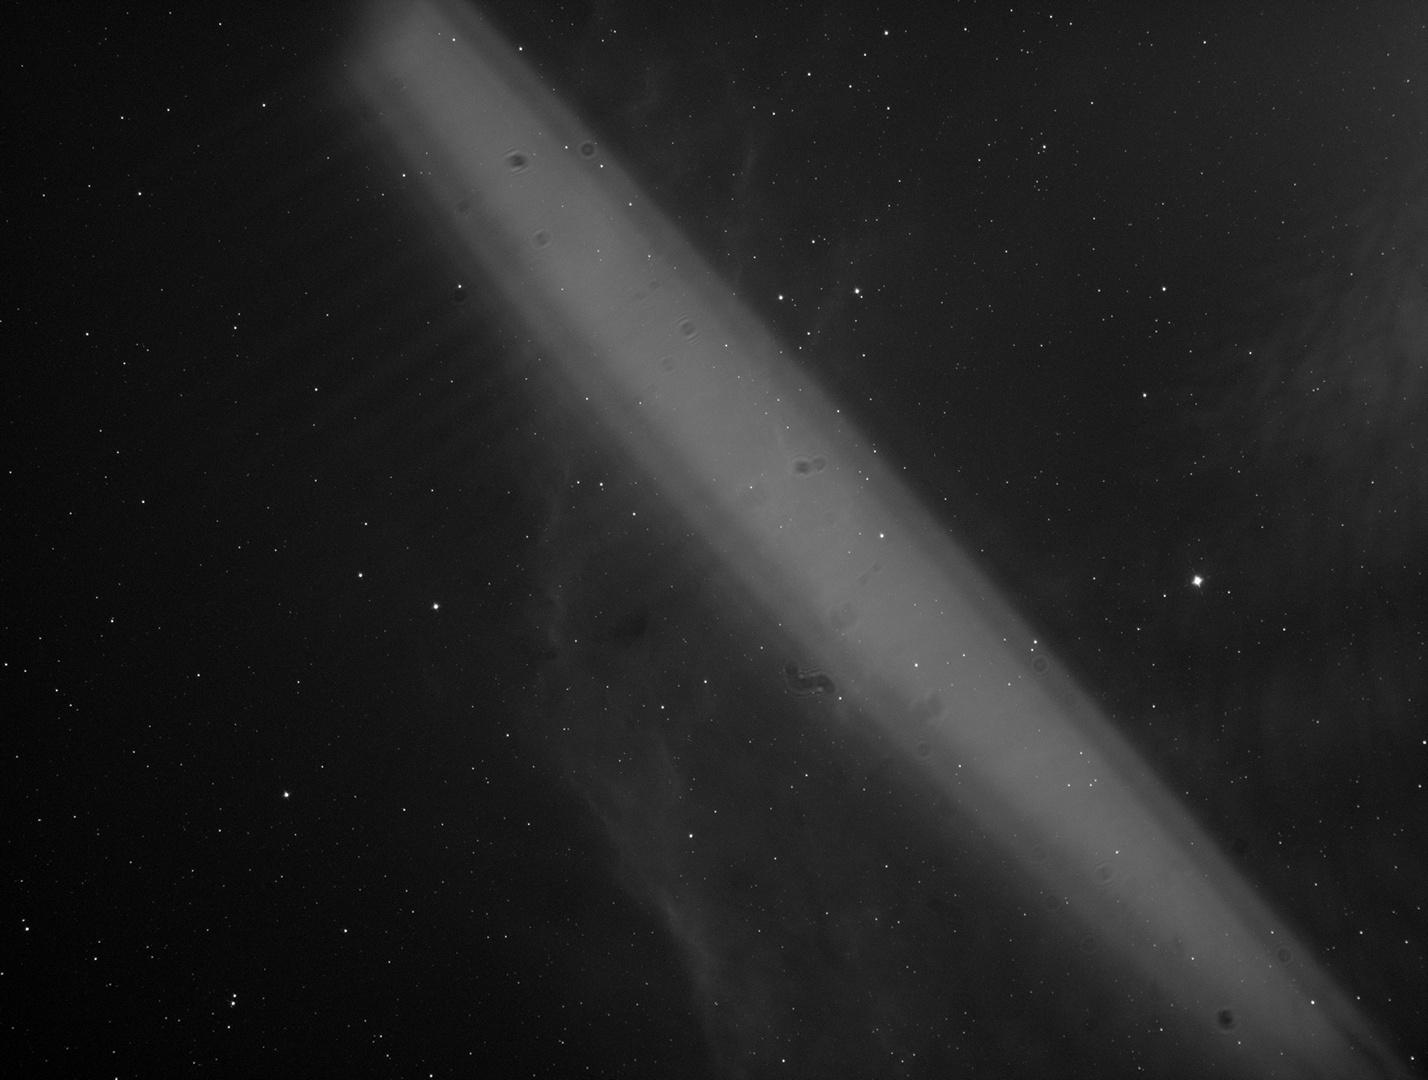 NGC1499_Hstar6_31-10-19_Ha-004_300 Scaled.jpg